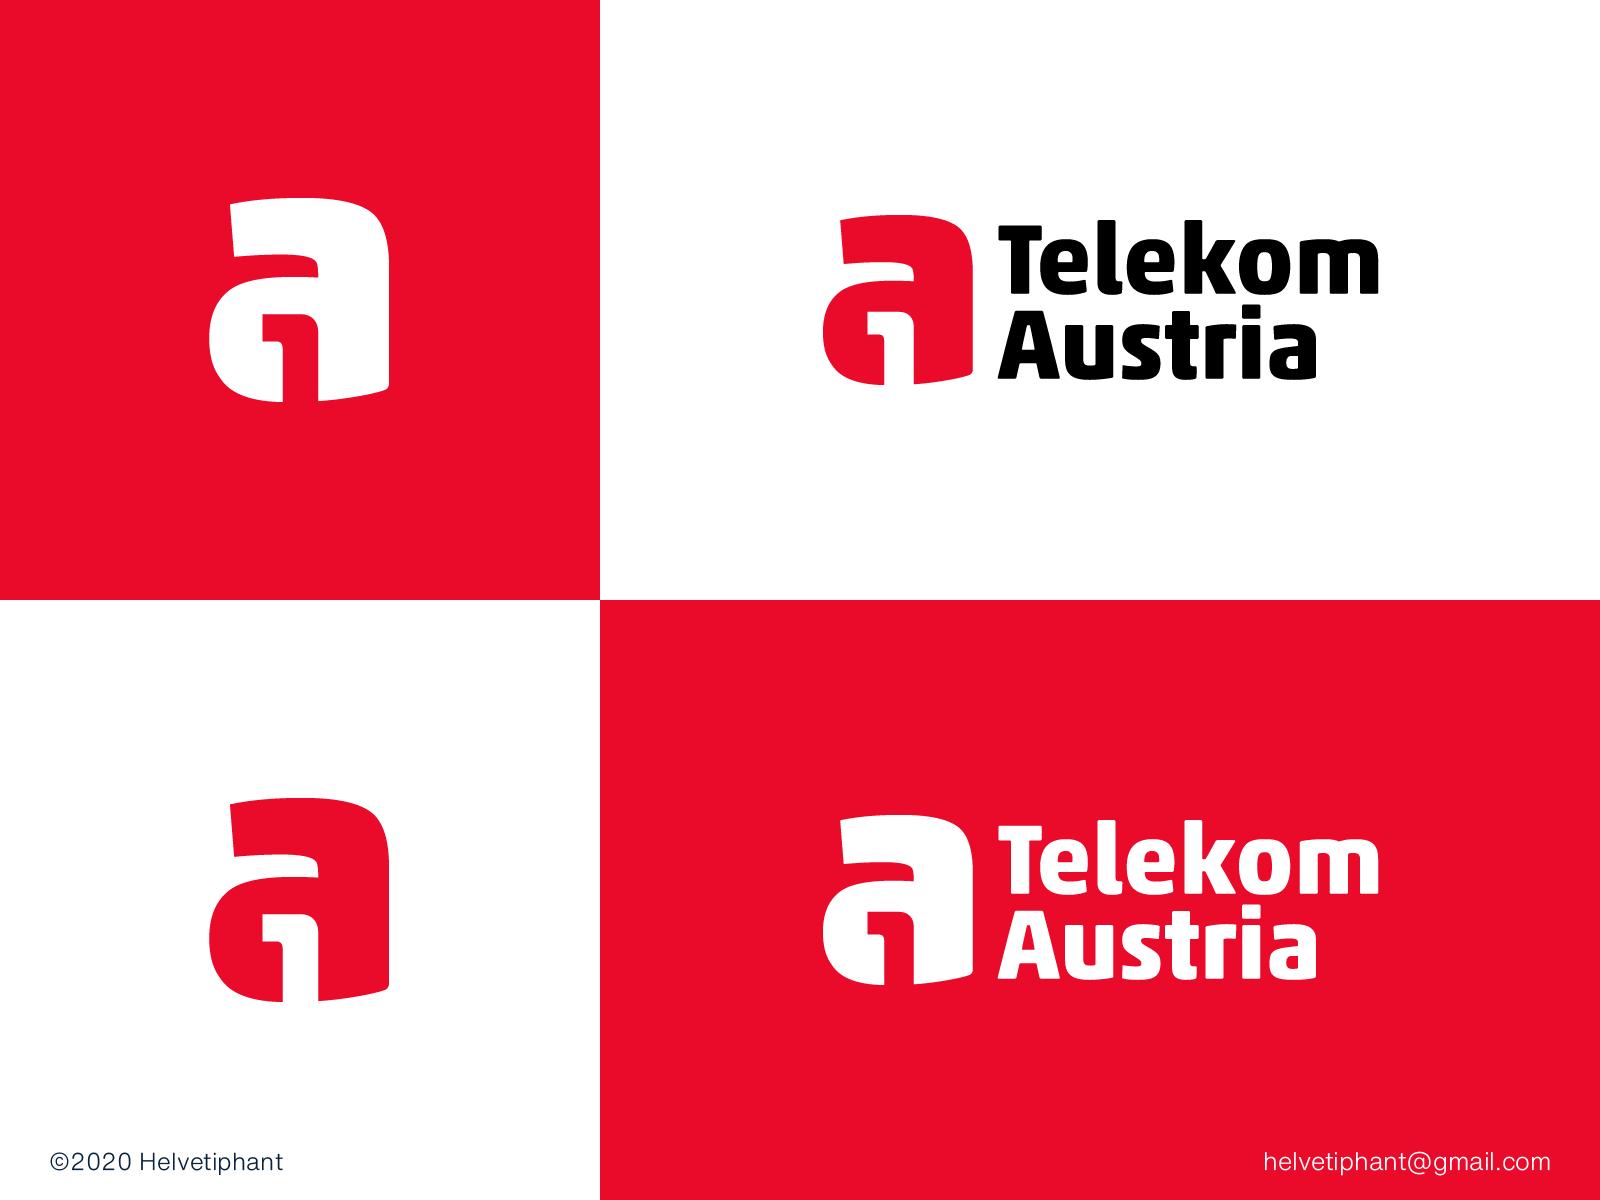 A1 Telekom Austria Proposal In 2020 Negative Space Logos Proposal Design Proposal